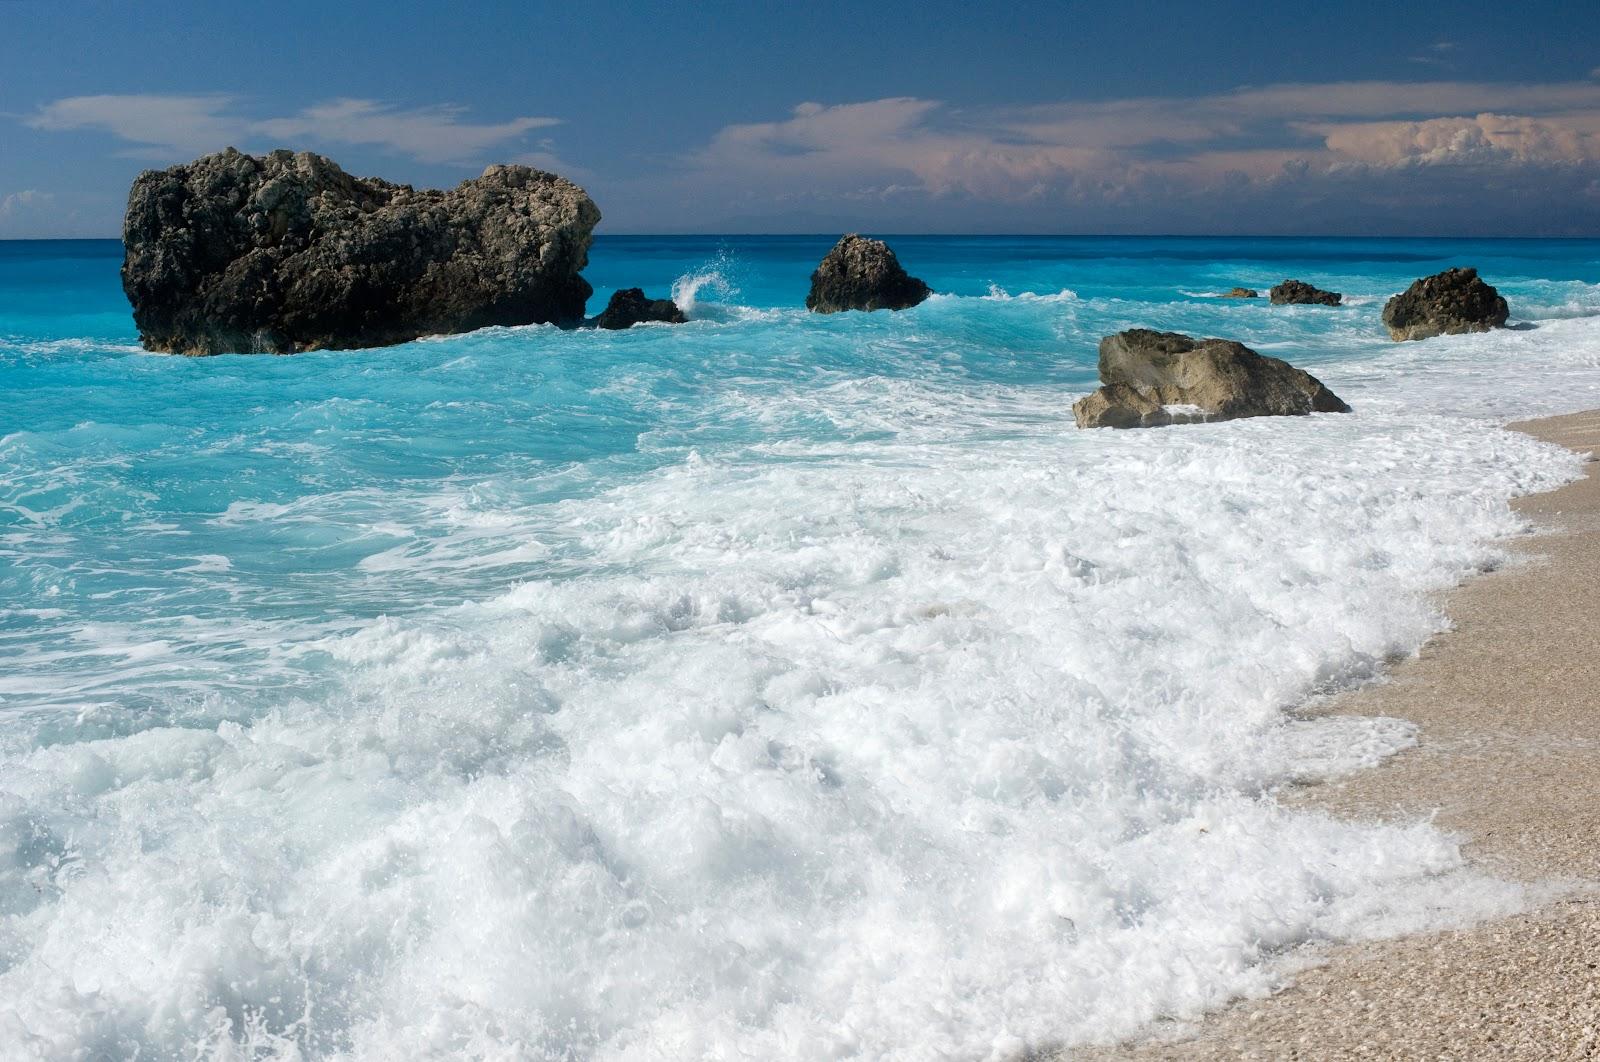 20100726_Kalamitsi_Beach_Ionian_Sea_Lefkada_island_Greece.jpg